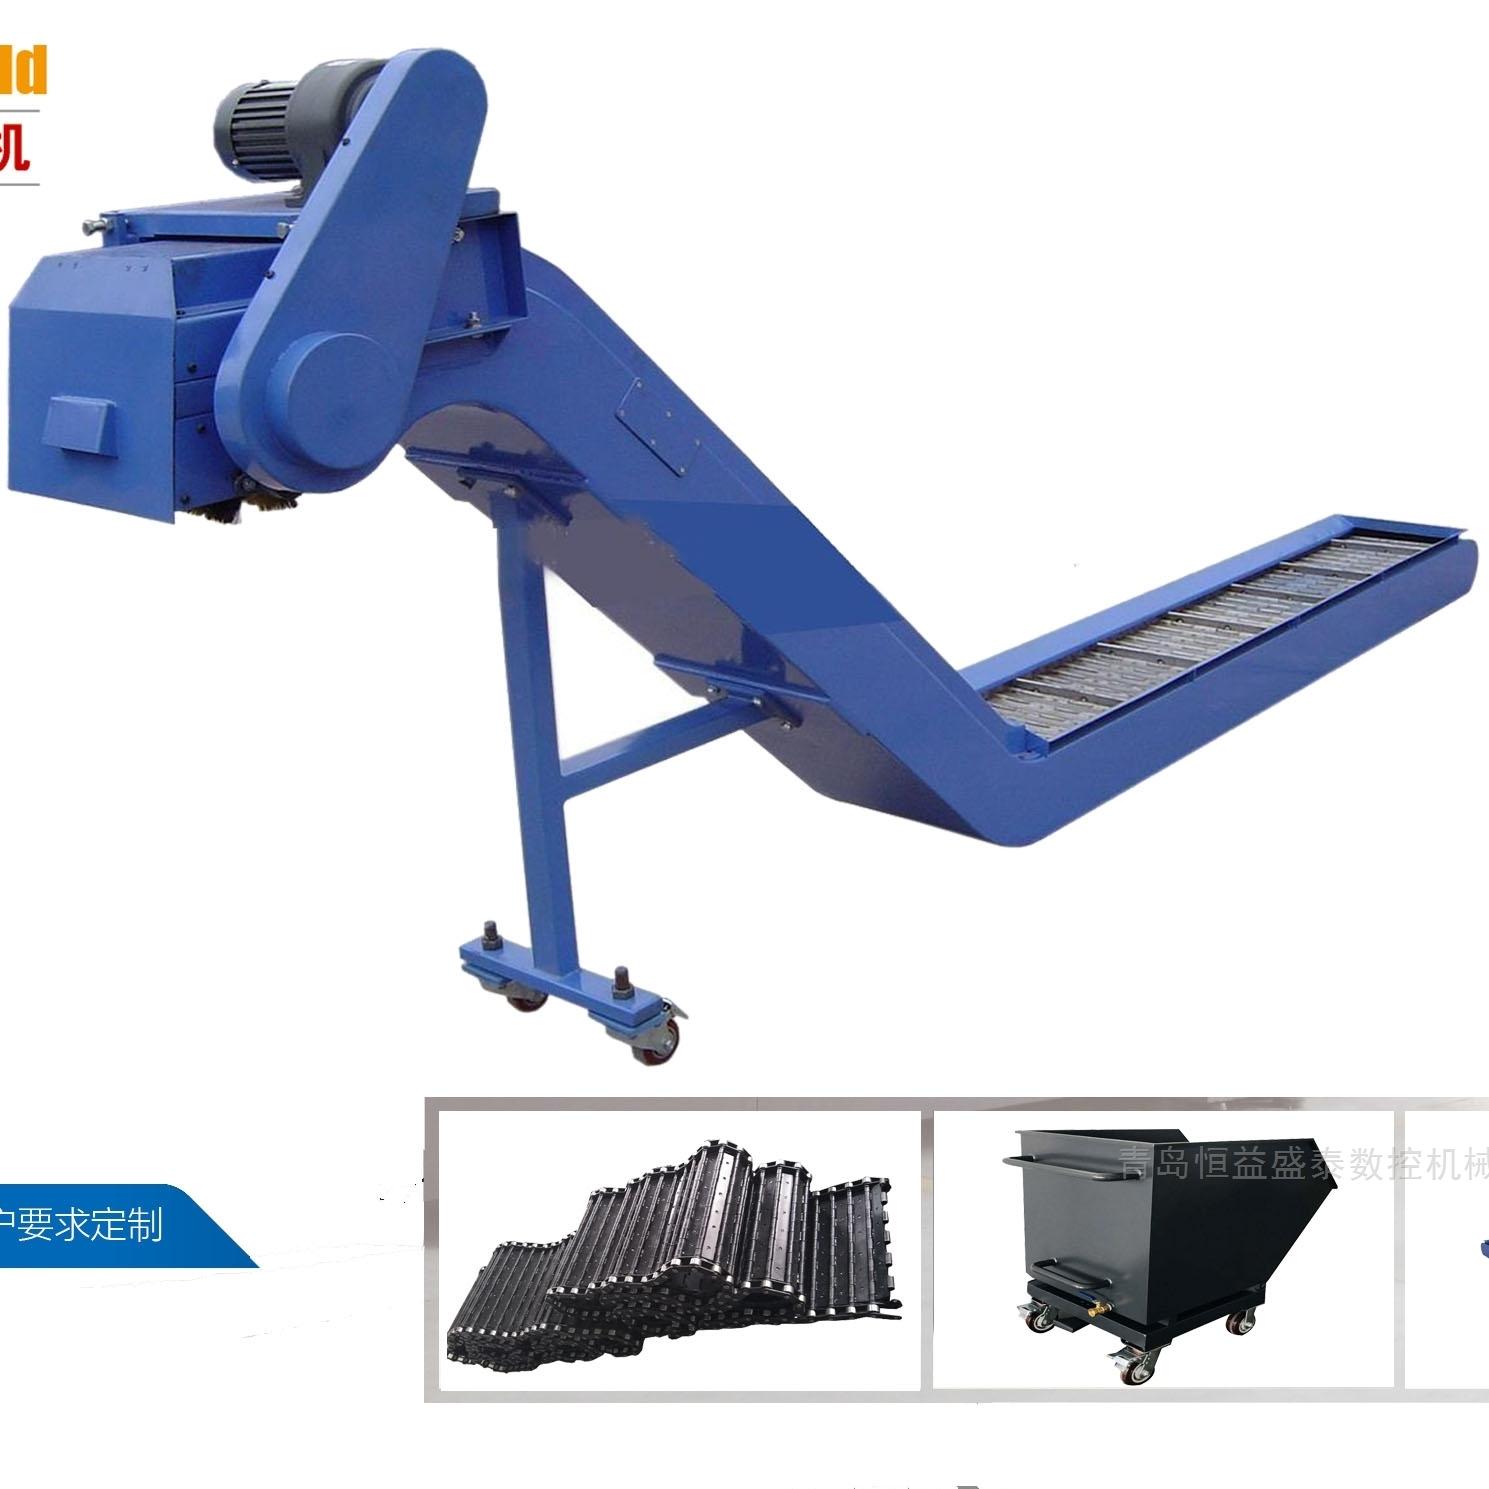 CL56CW数控车床排屑机链板排屑器现货厂家